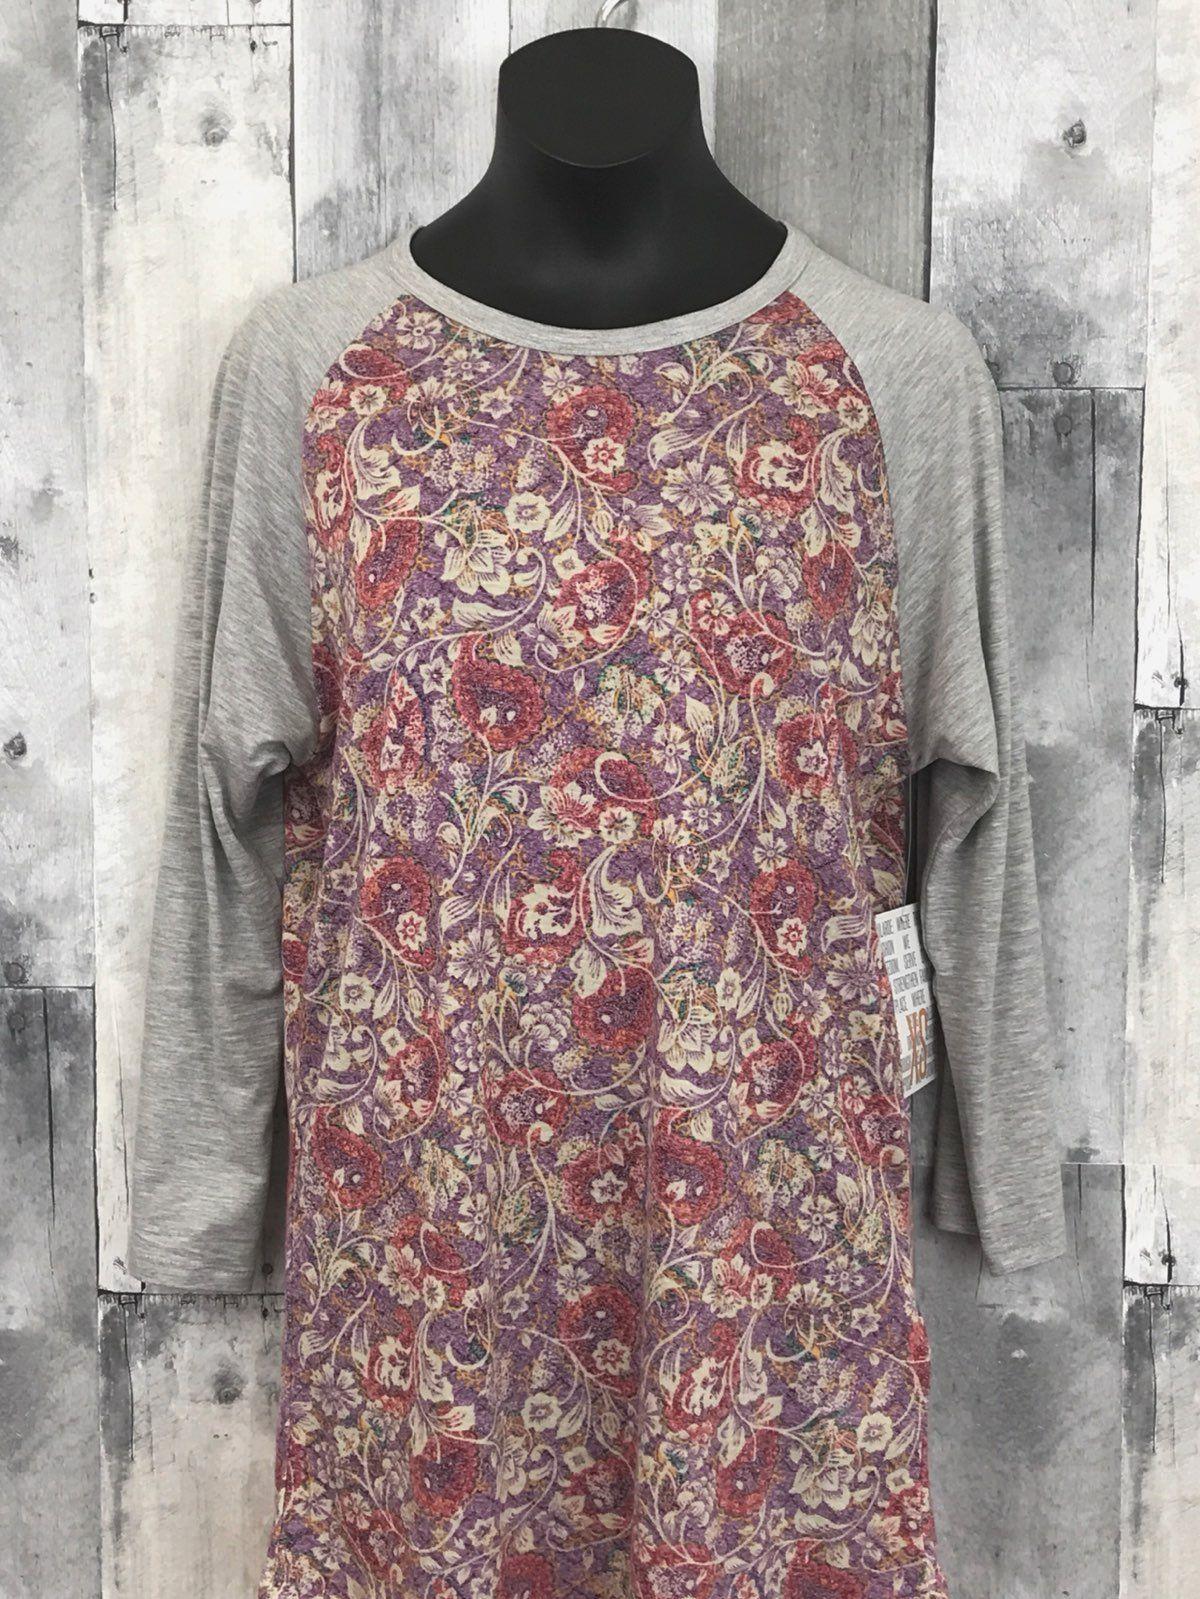 XS LulaRoe Randy, Rayon Blend Floral NWT - Mercari: BUY & SELL THINGS YOU LOVE